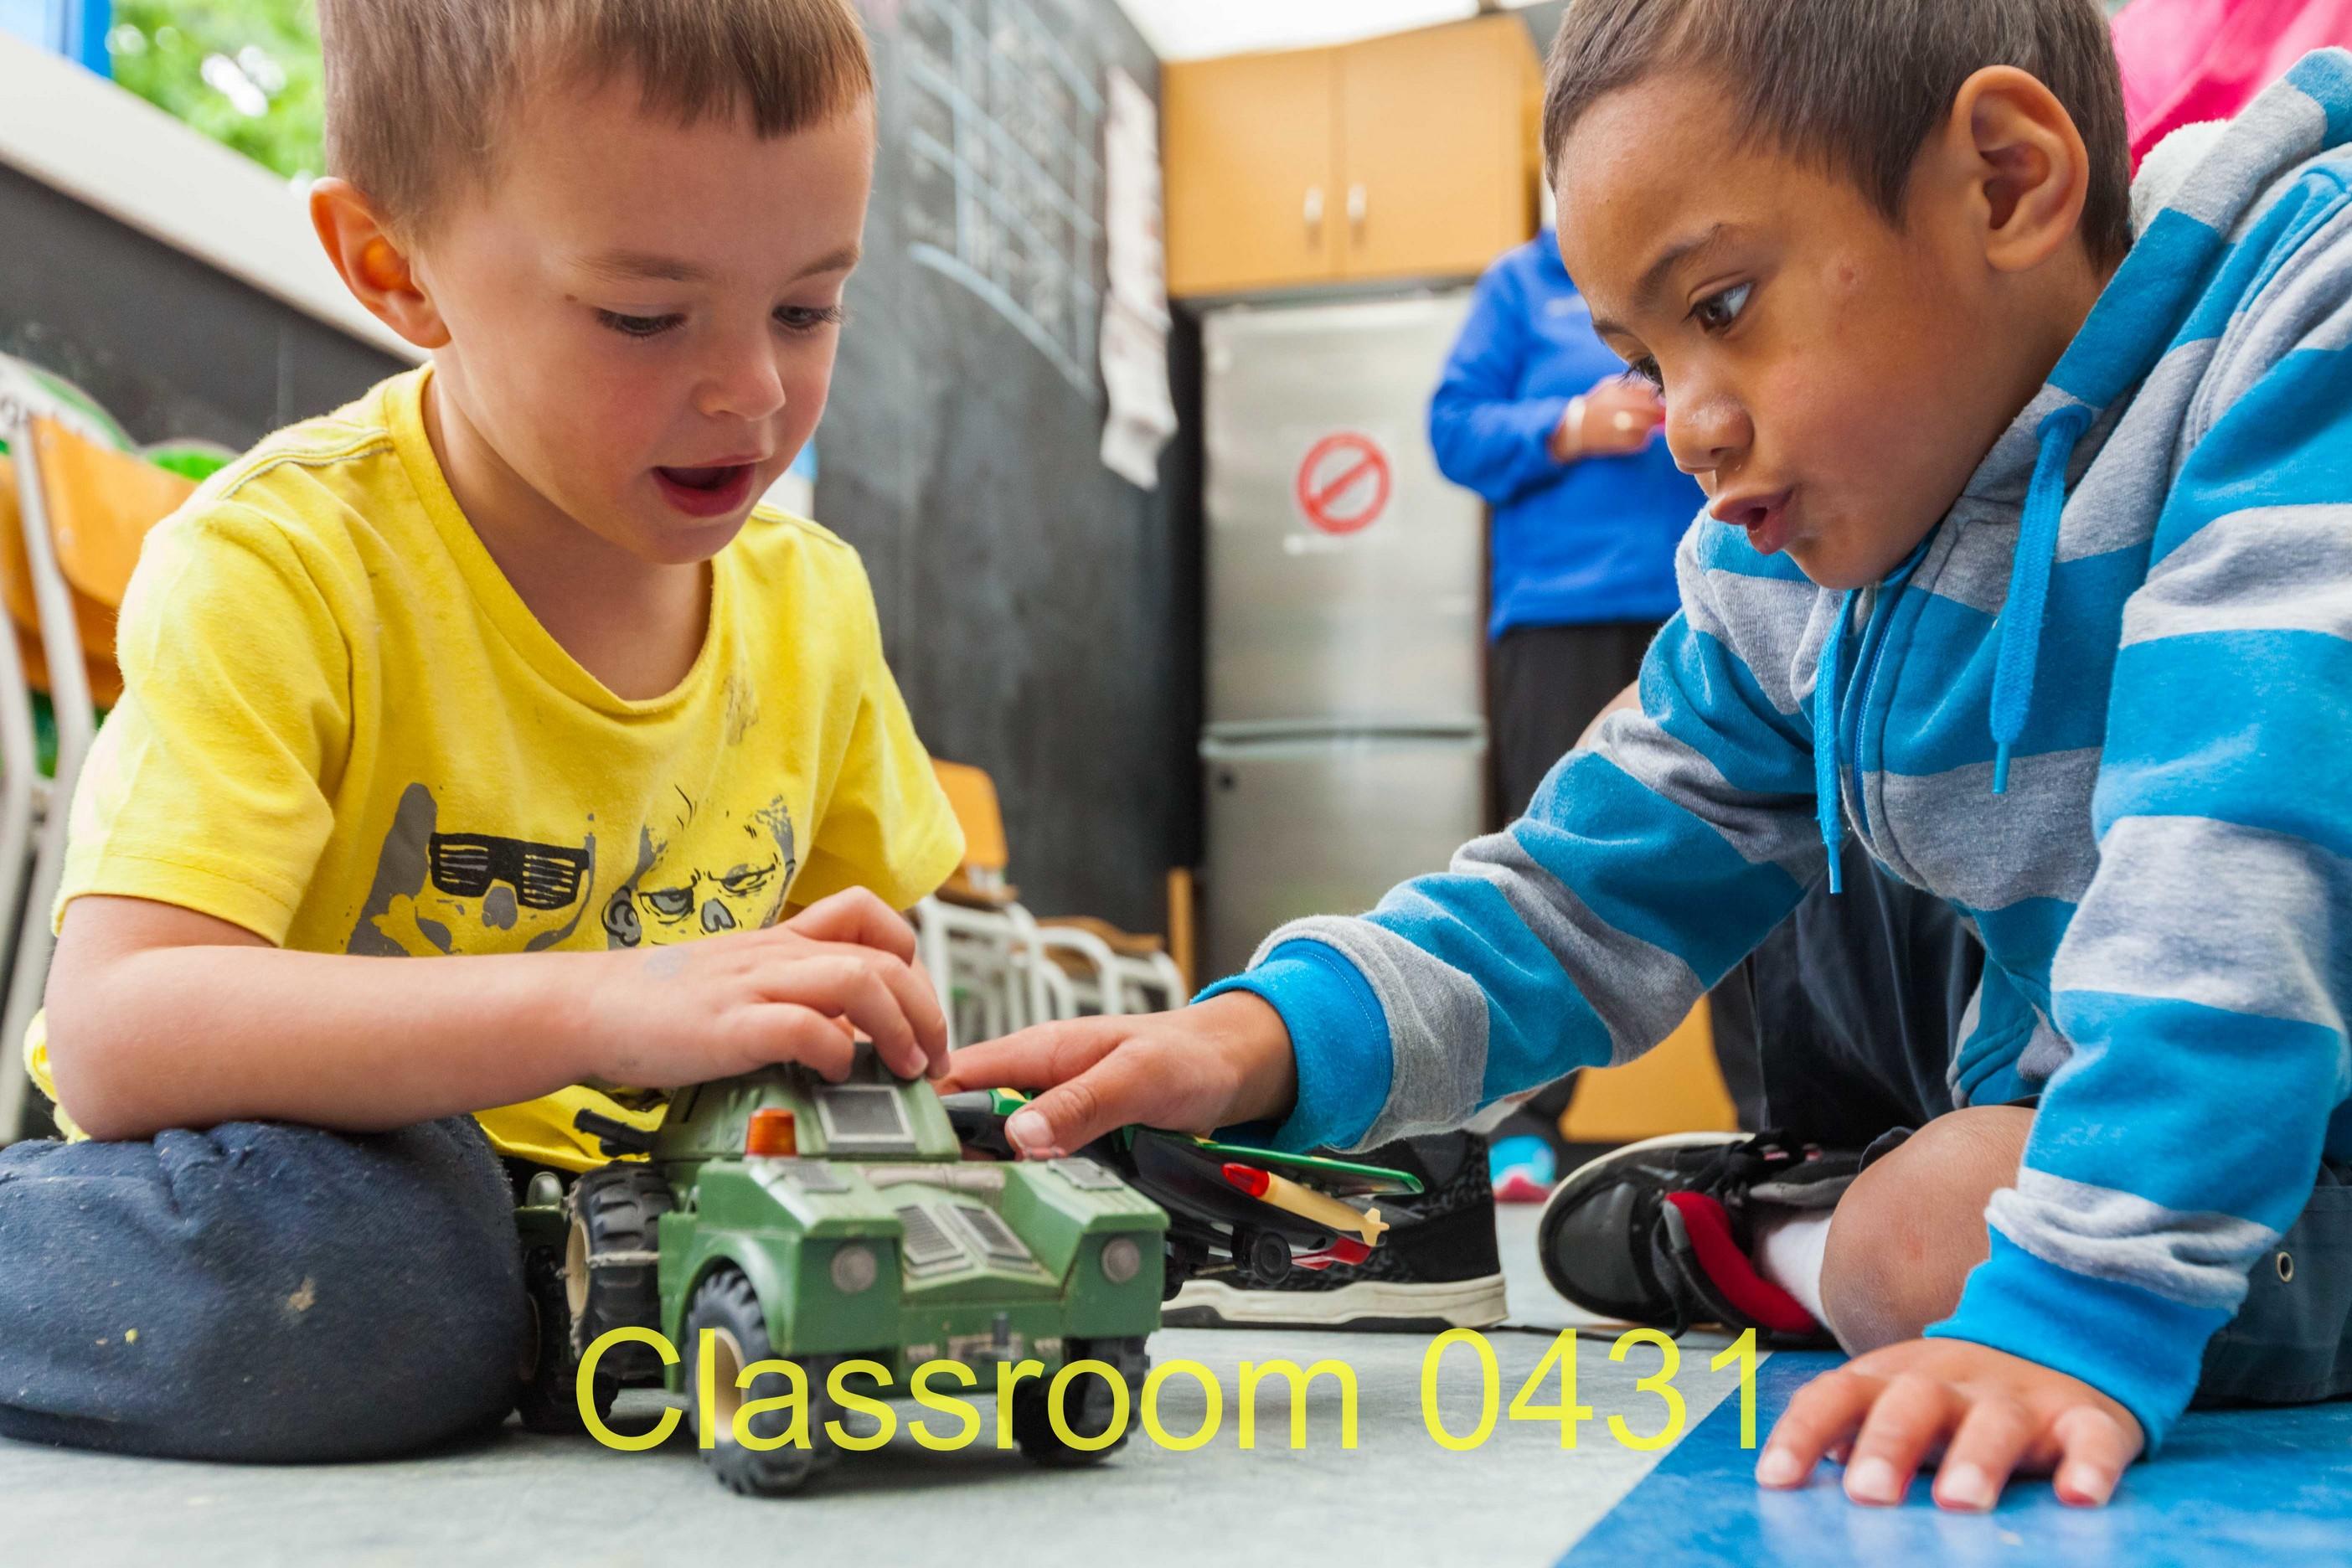 Classroom 0431